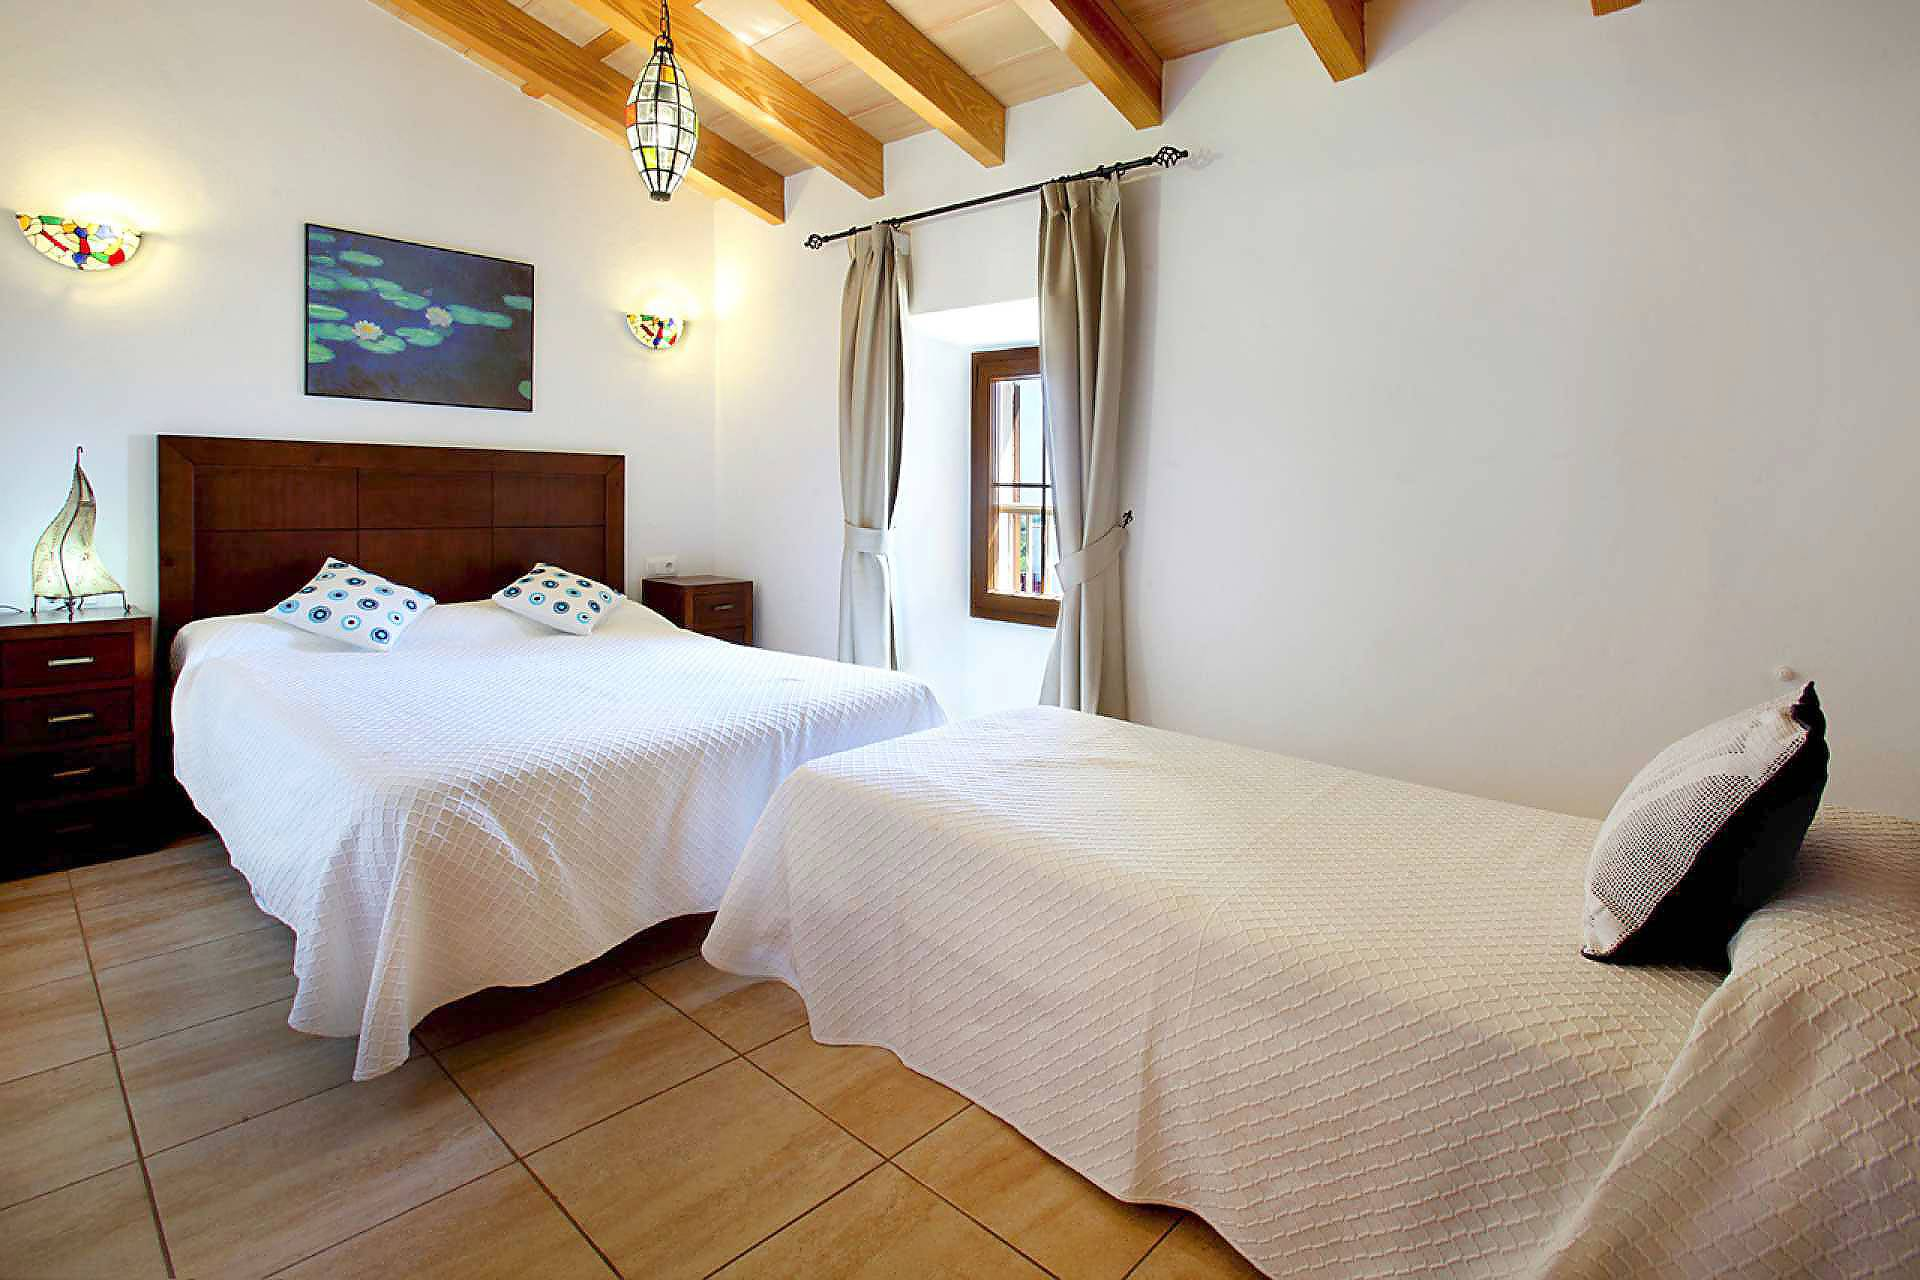 01-33 Großzügiges Ferienhaus Mallorca Osten Bild 33